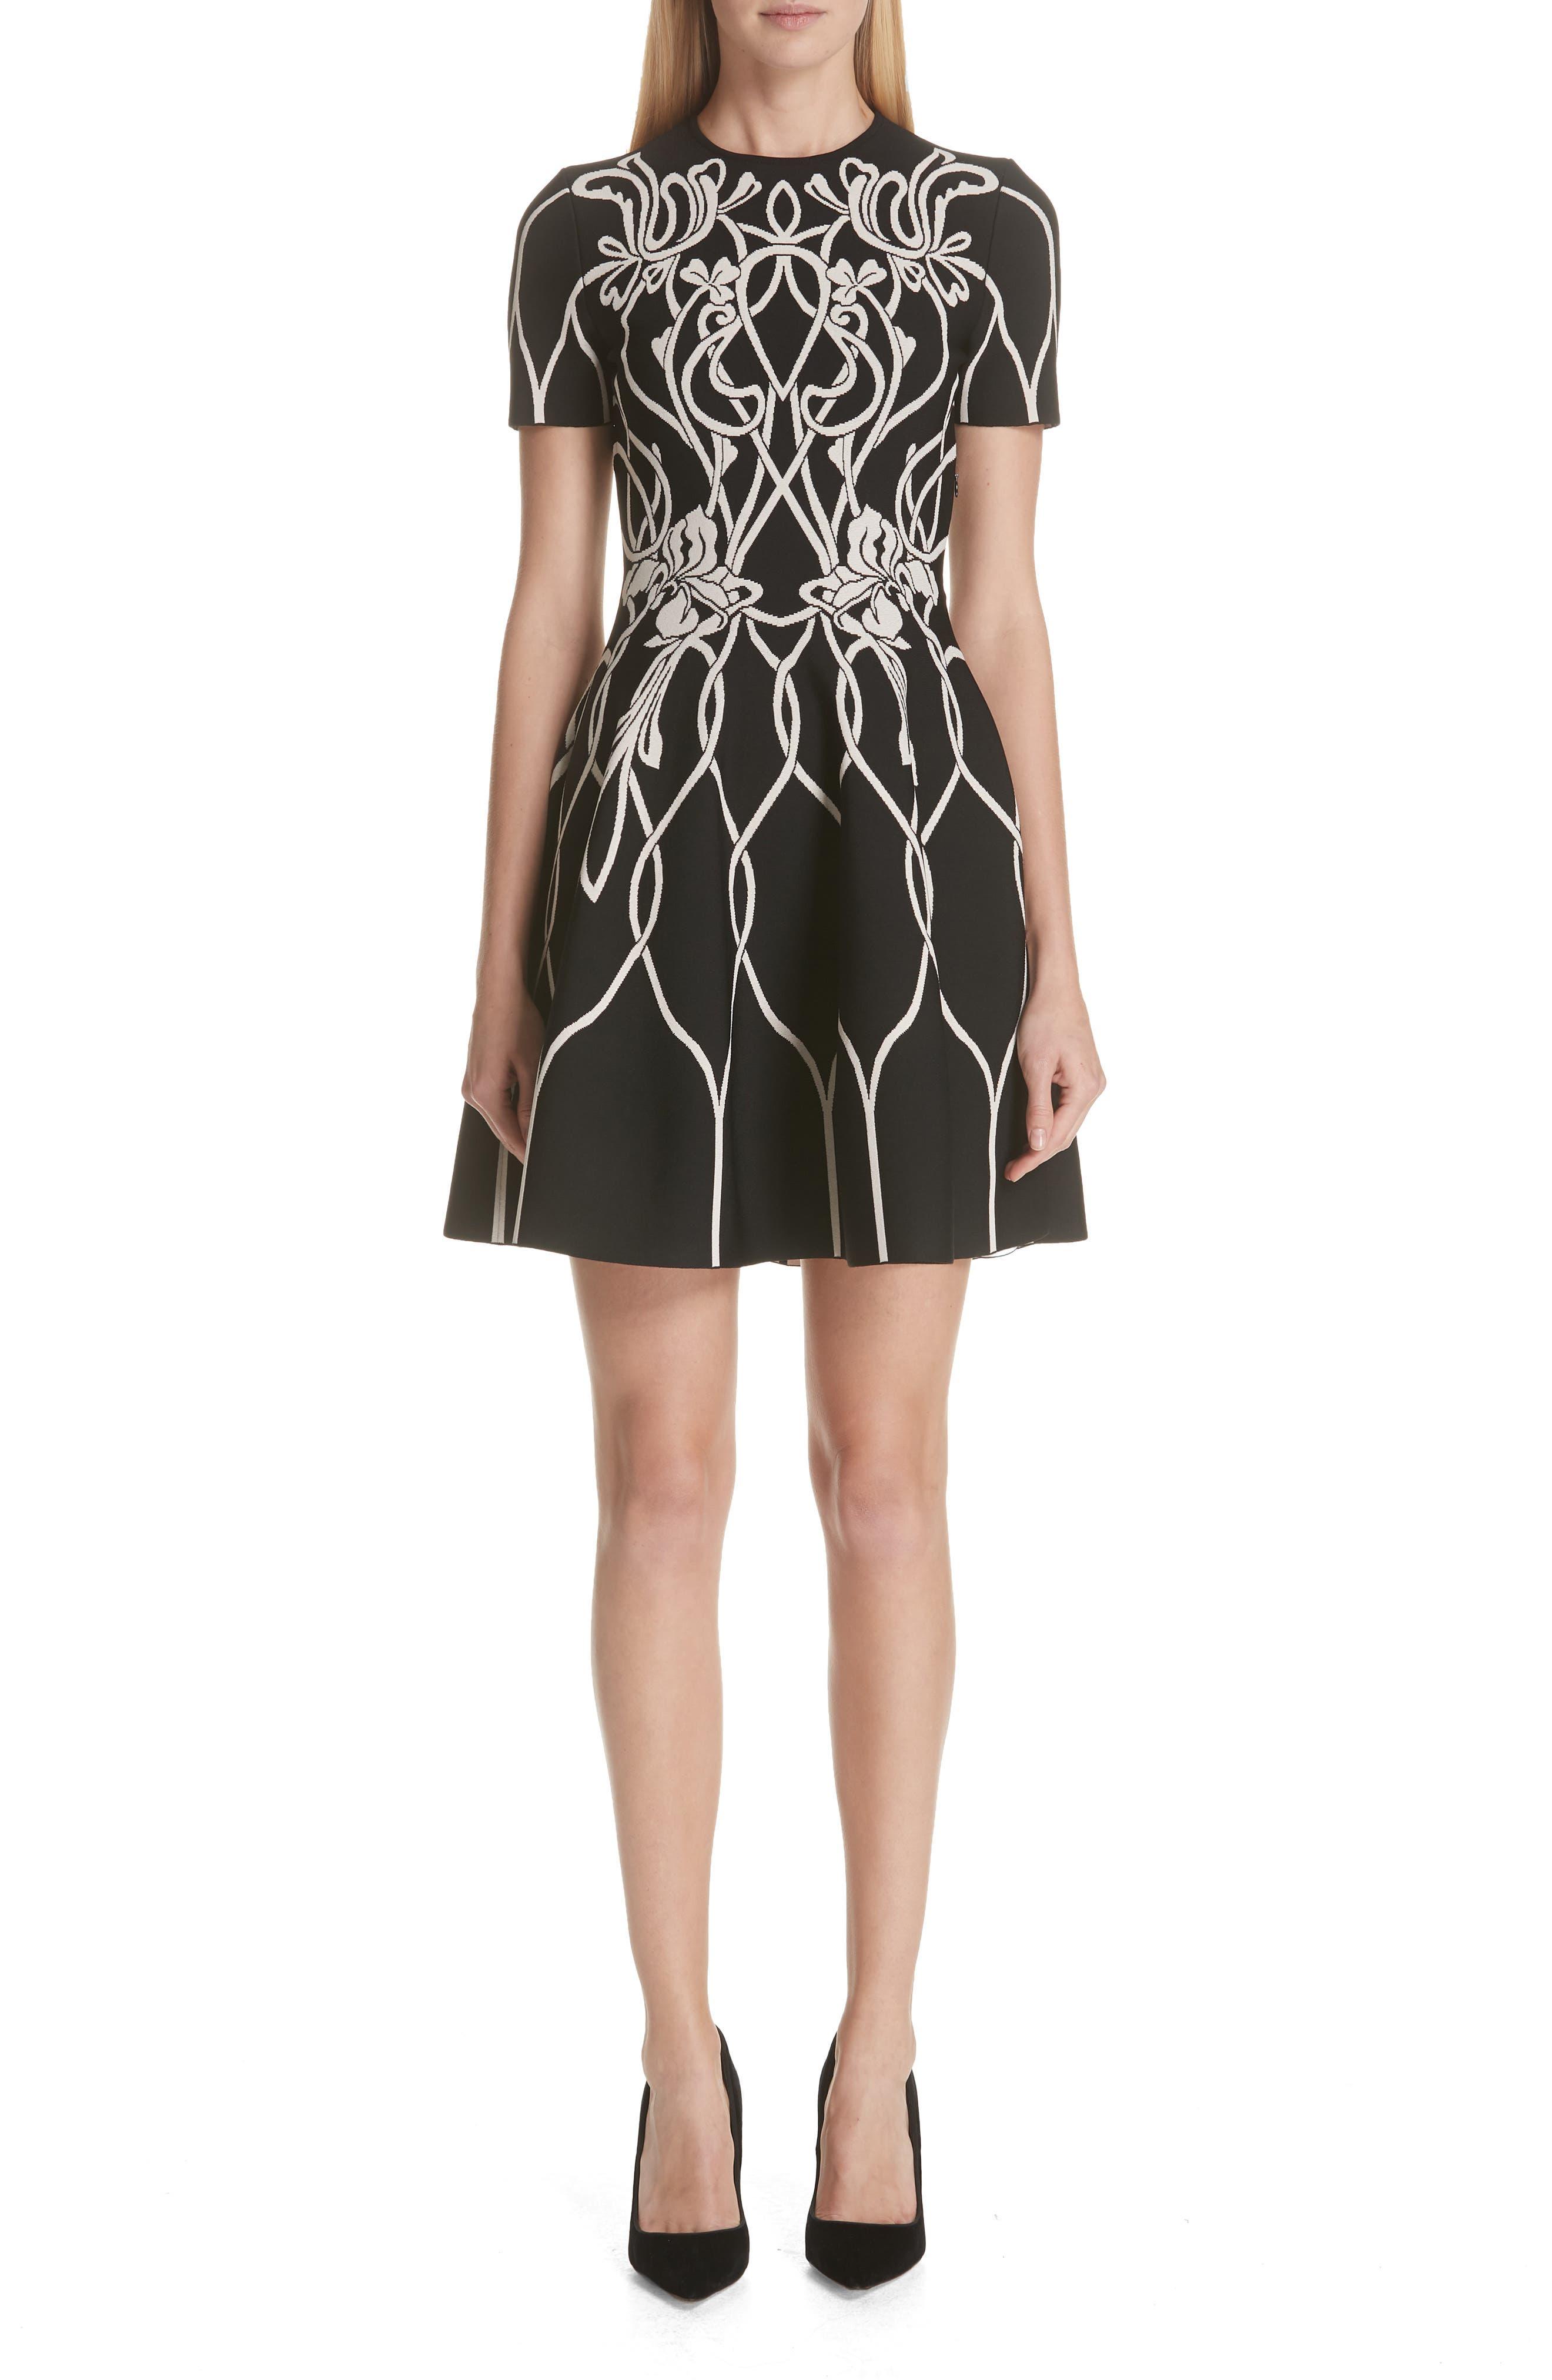 Alexander McQueen Art Nouveau Jacquard Knit Dress